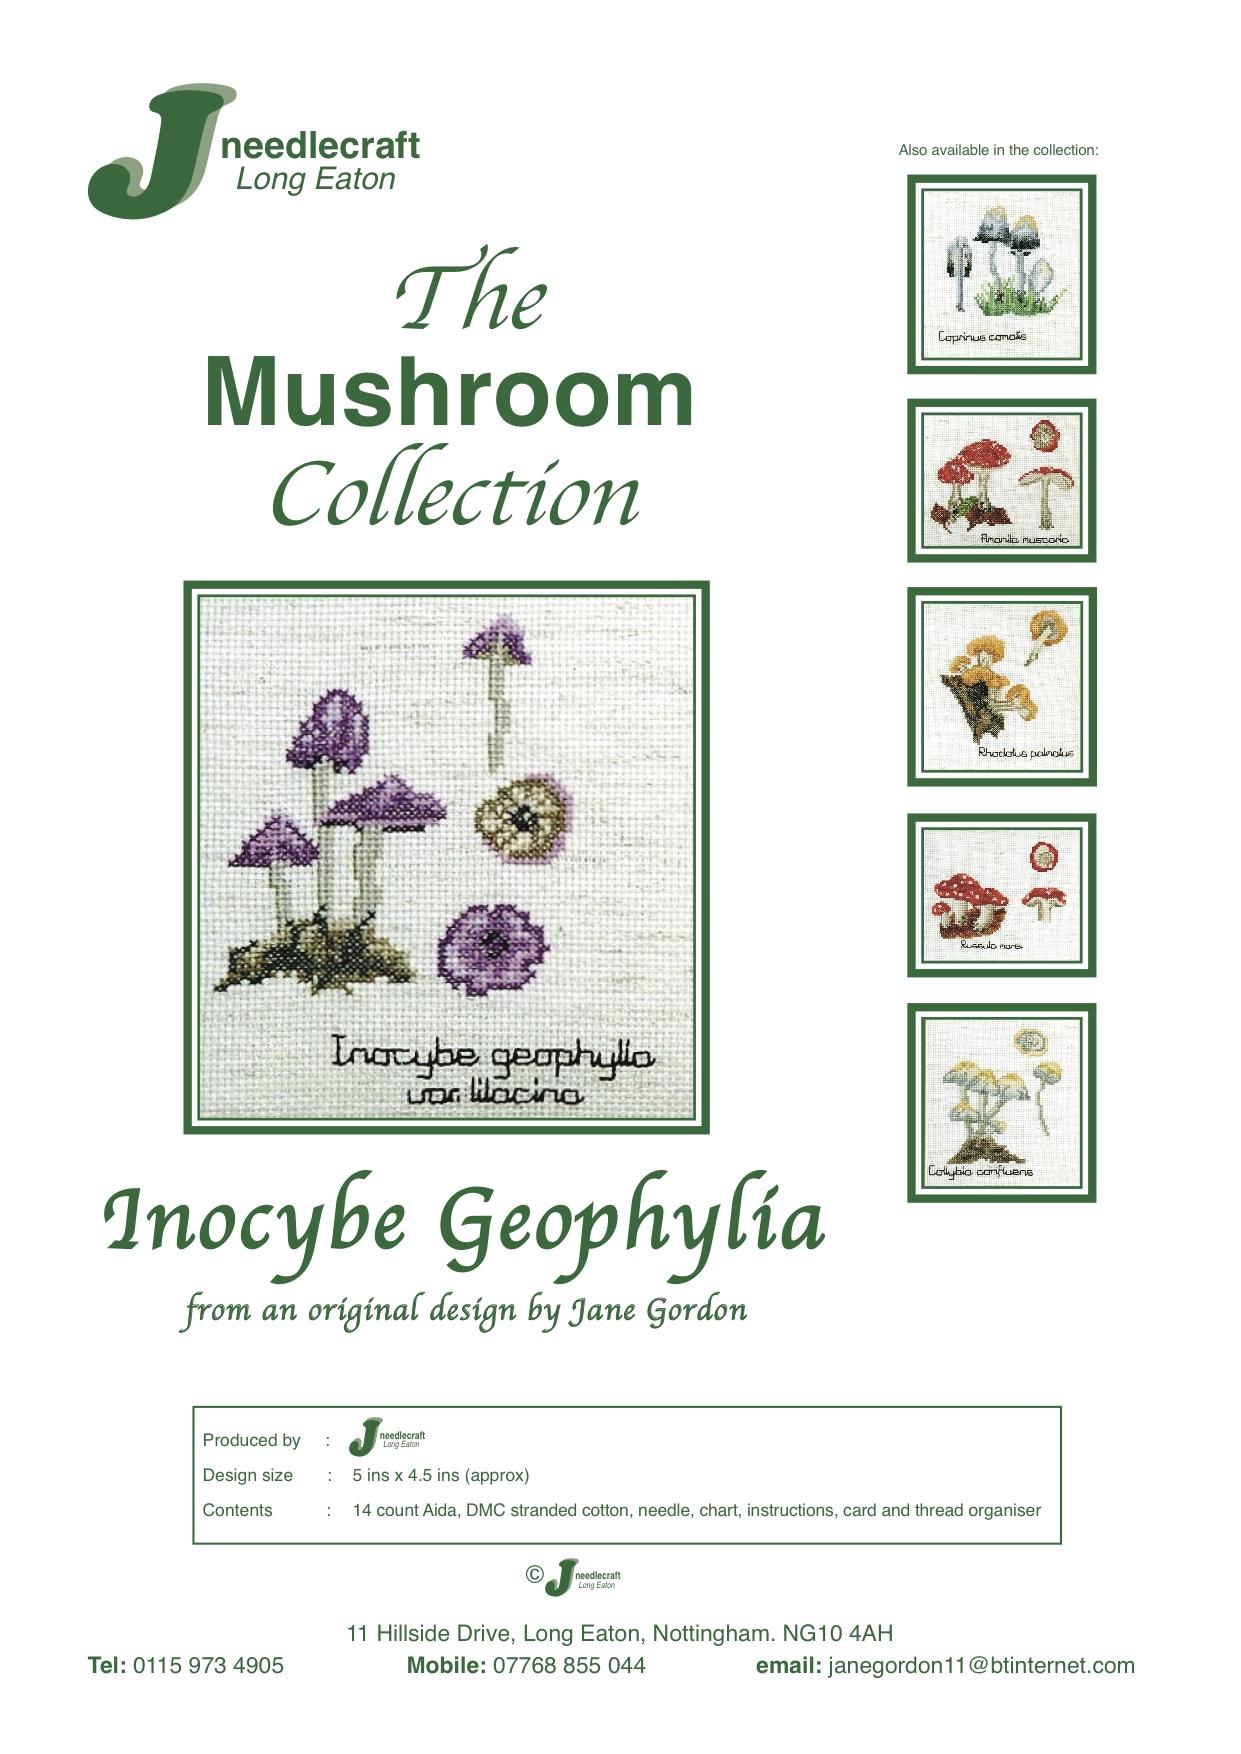 Inocybe geophylla mushroom cross stitch kit front cover